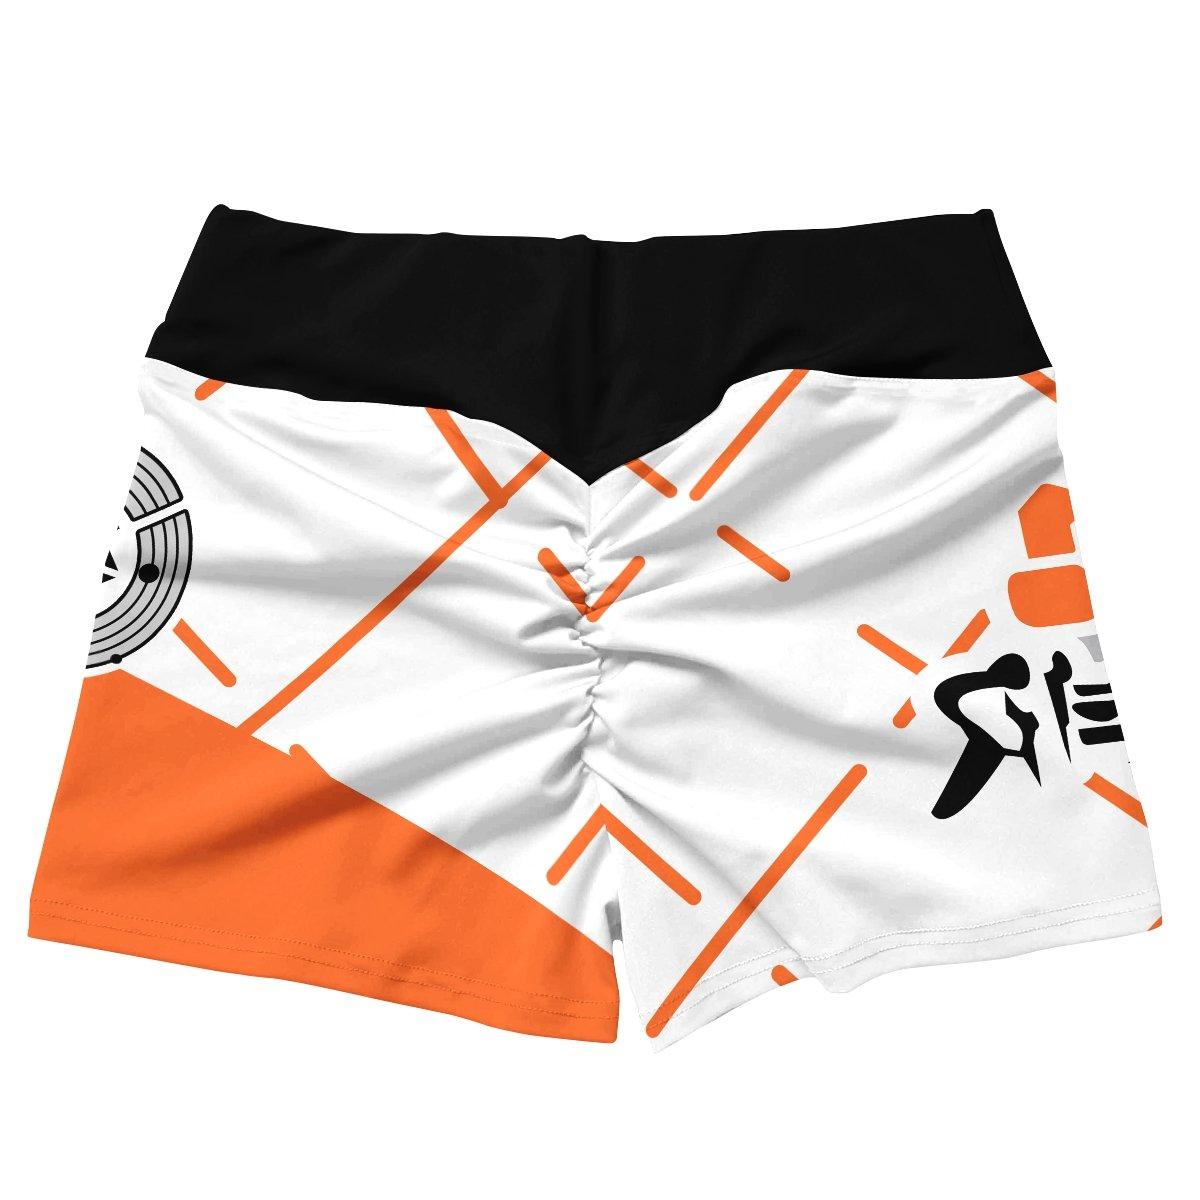 pokemon fighting uniform active wear set 393683 - Anime Swimsuits